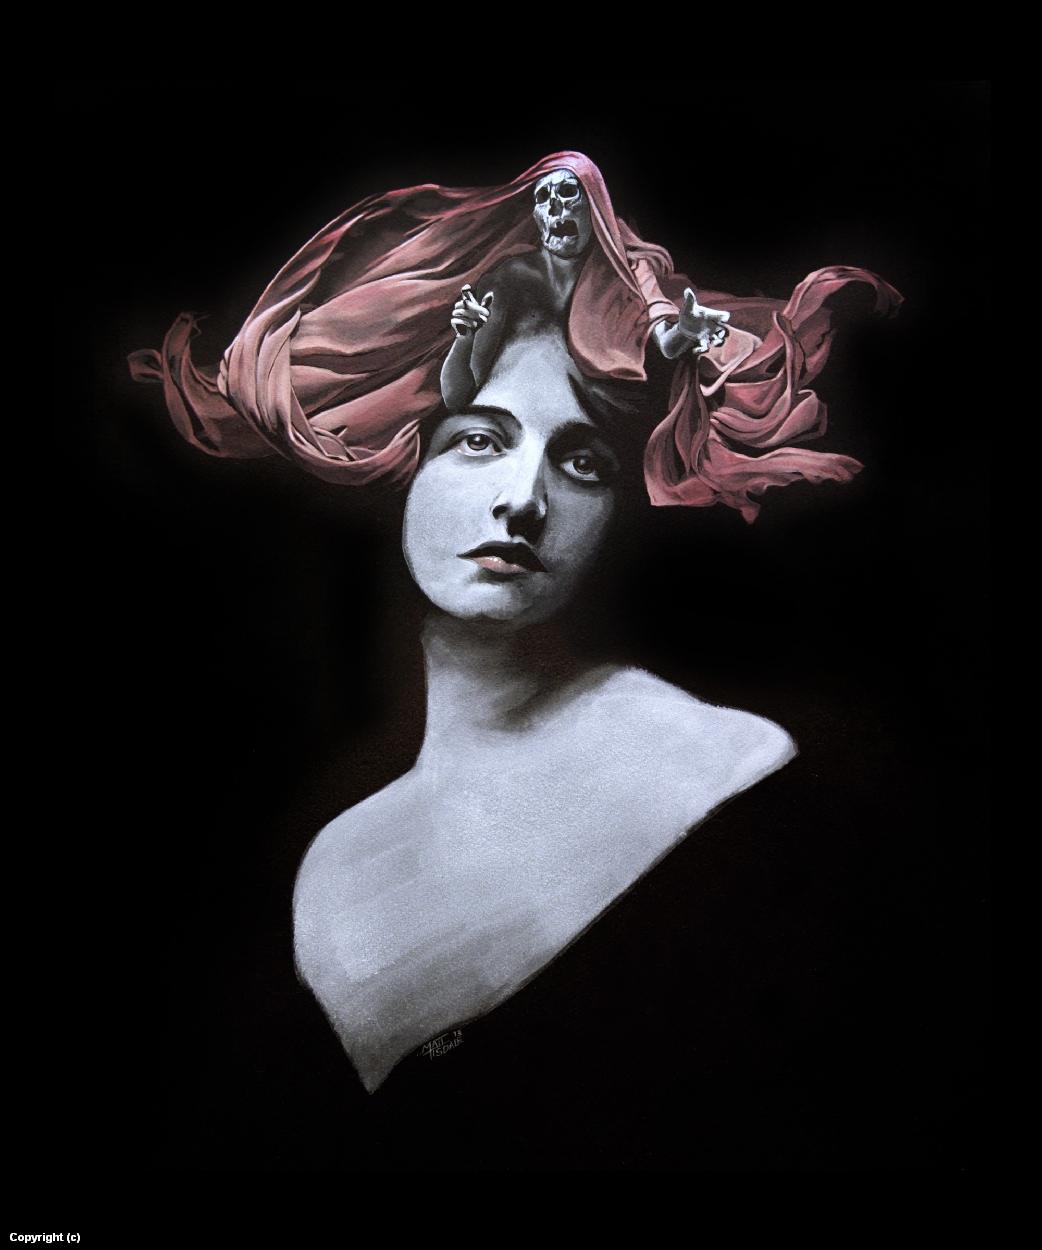 Death's Head Artwork by Matt Tisdale